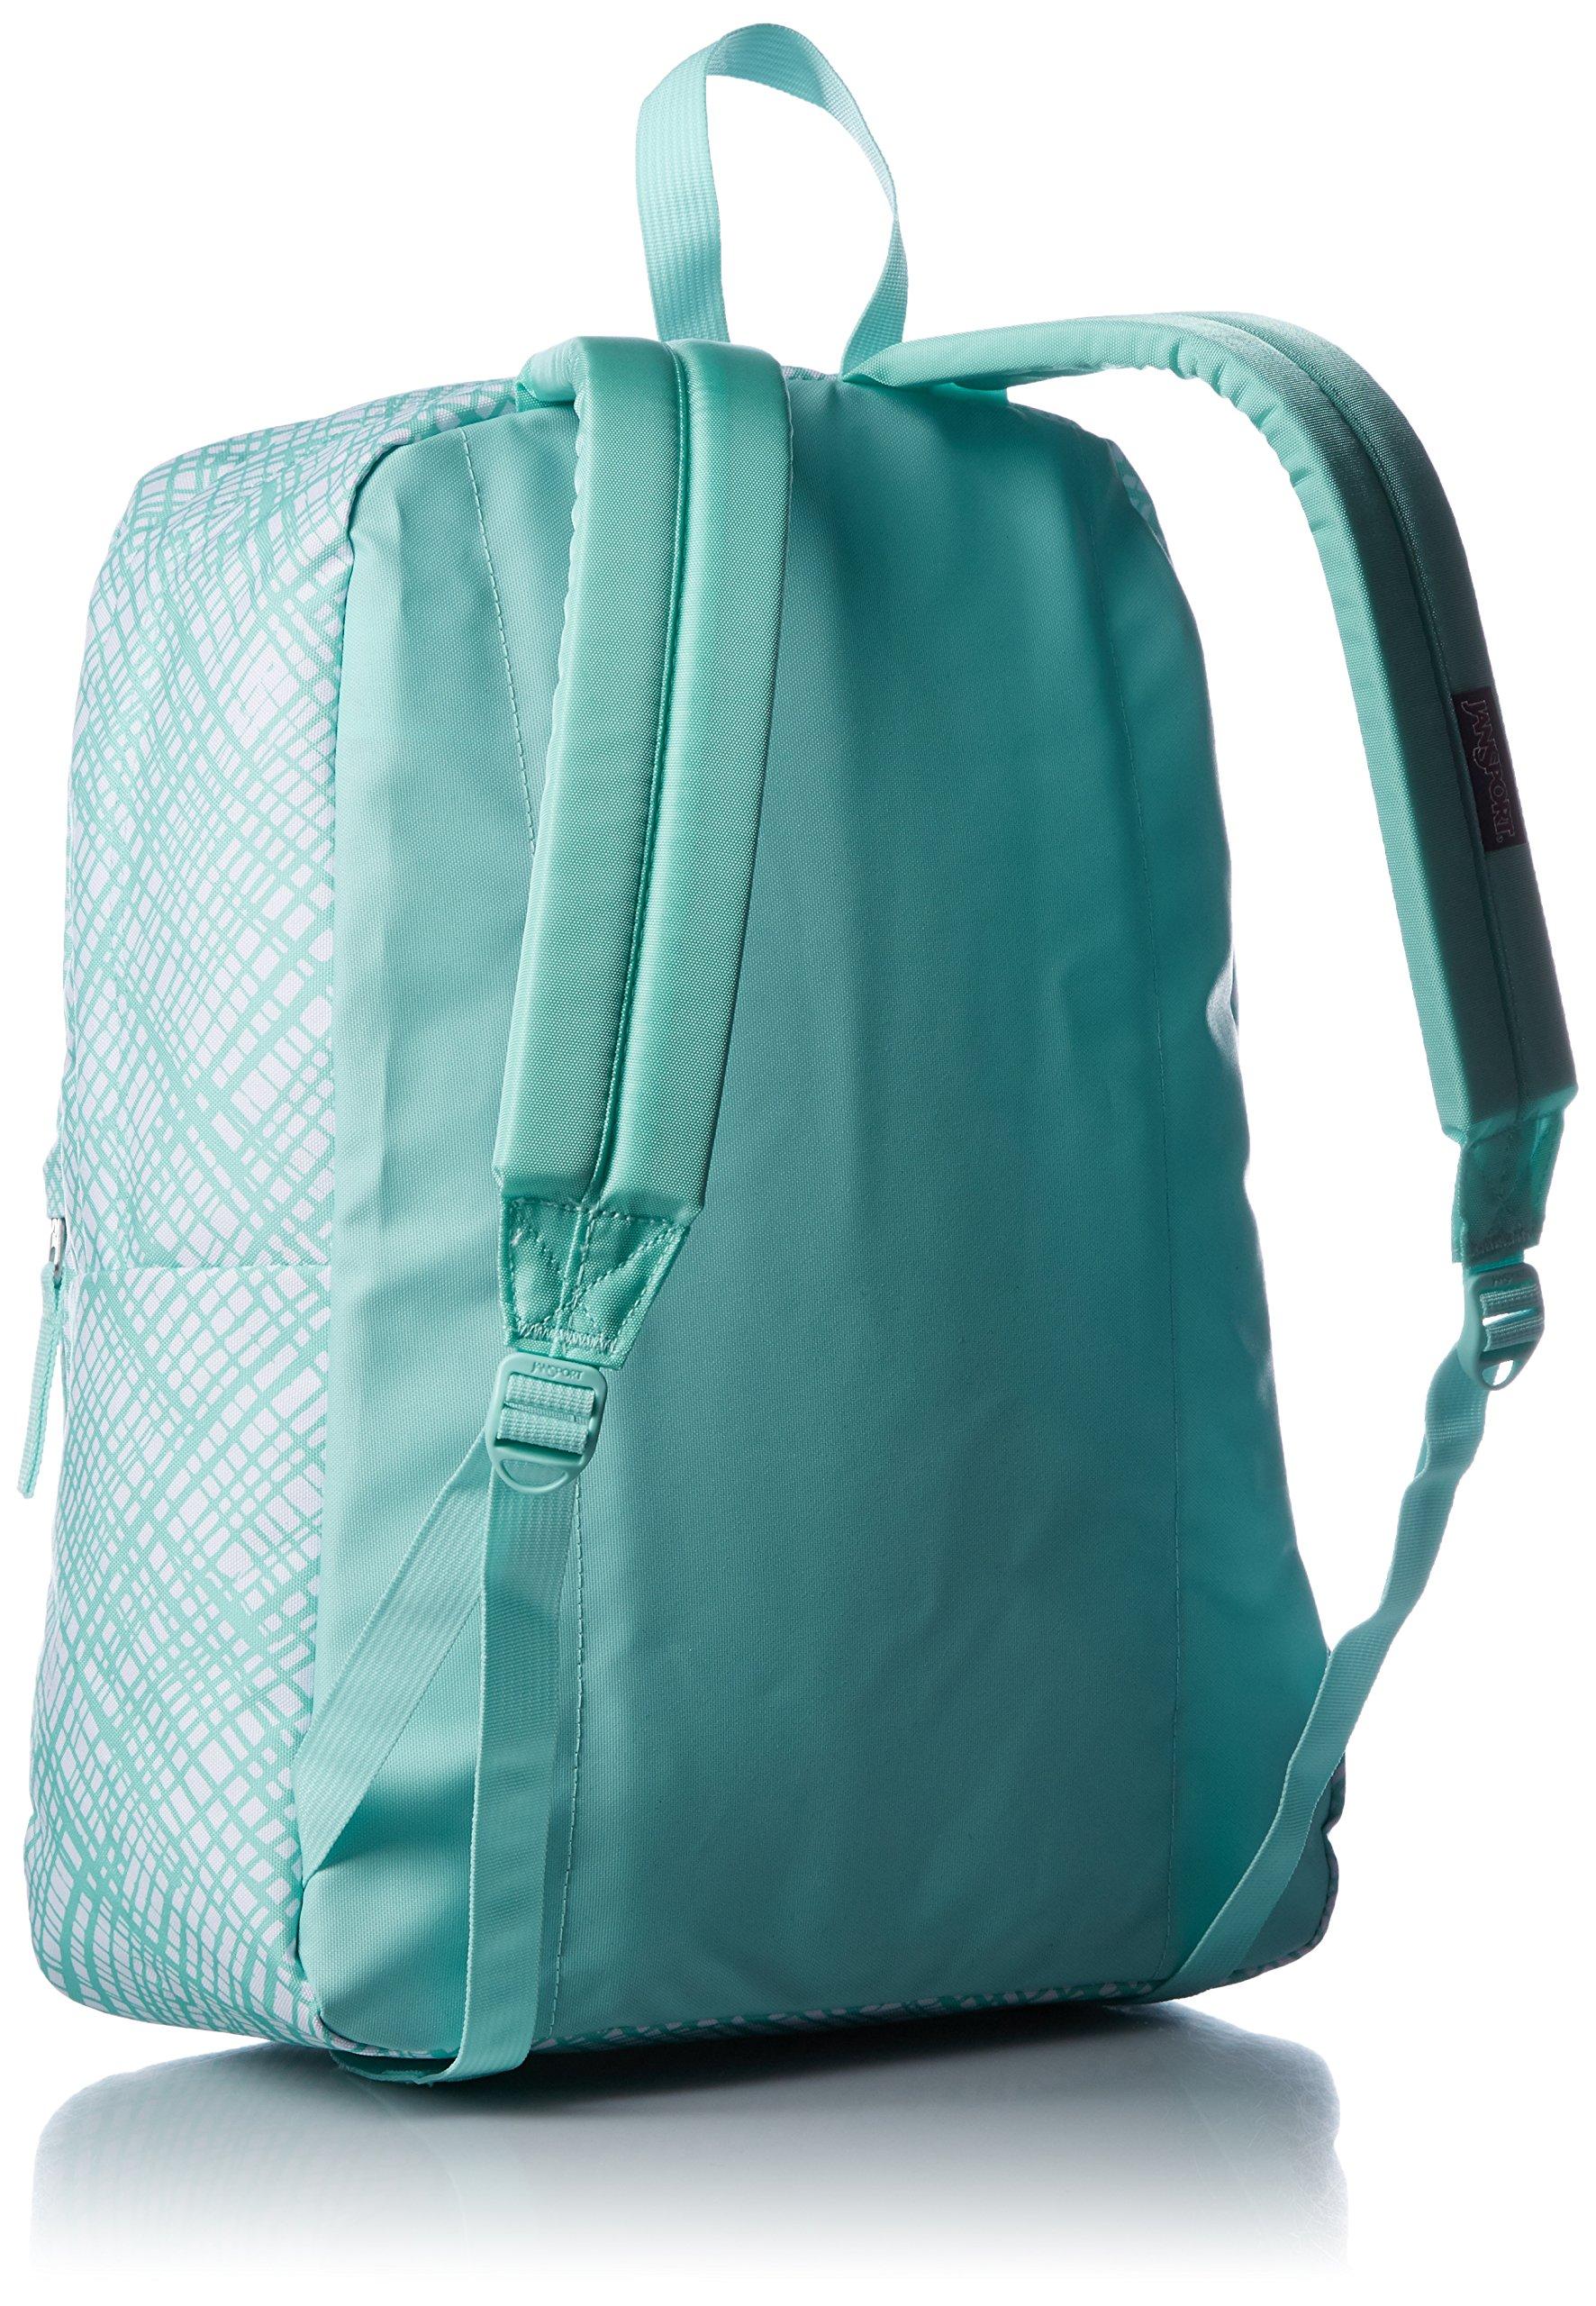 JanSport Womens Classic Mainstream Superbreak Backpack - Aqua Dash Jagged Plaid / 16.7'' H X 13'' W X 8.5'' D by JanSport (Image #2)